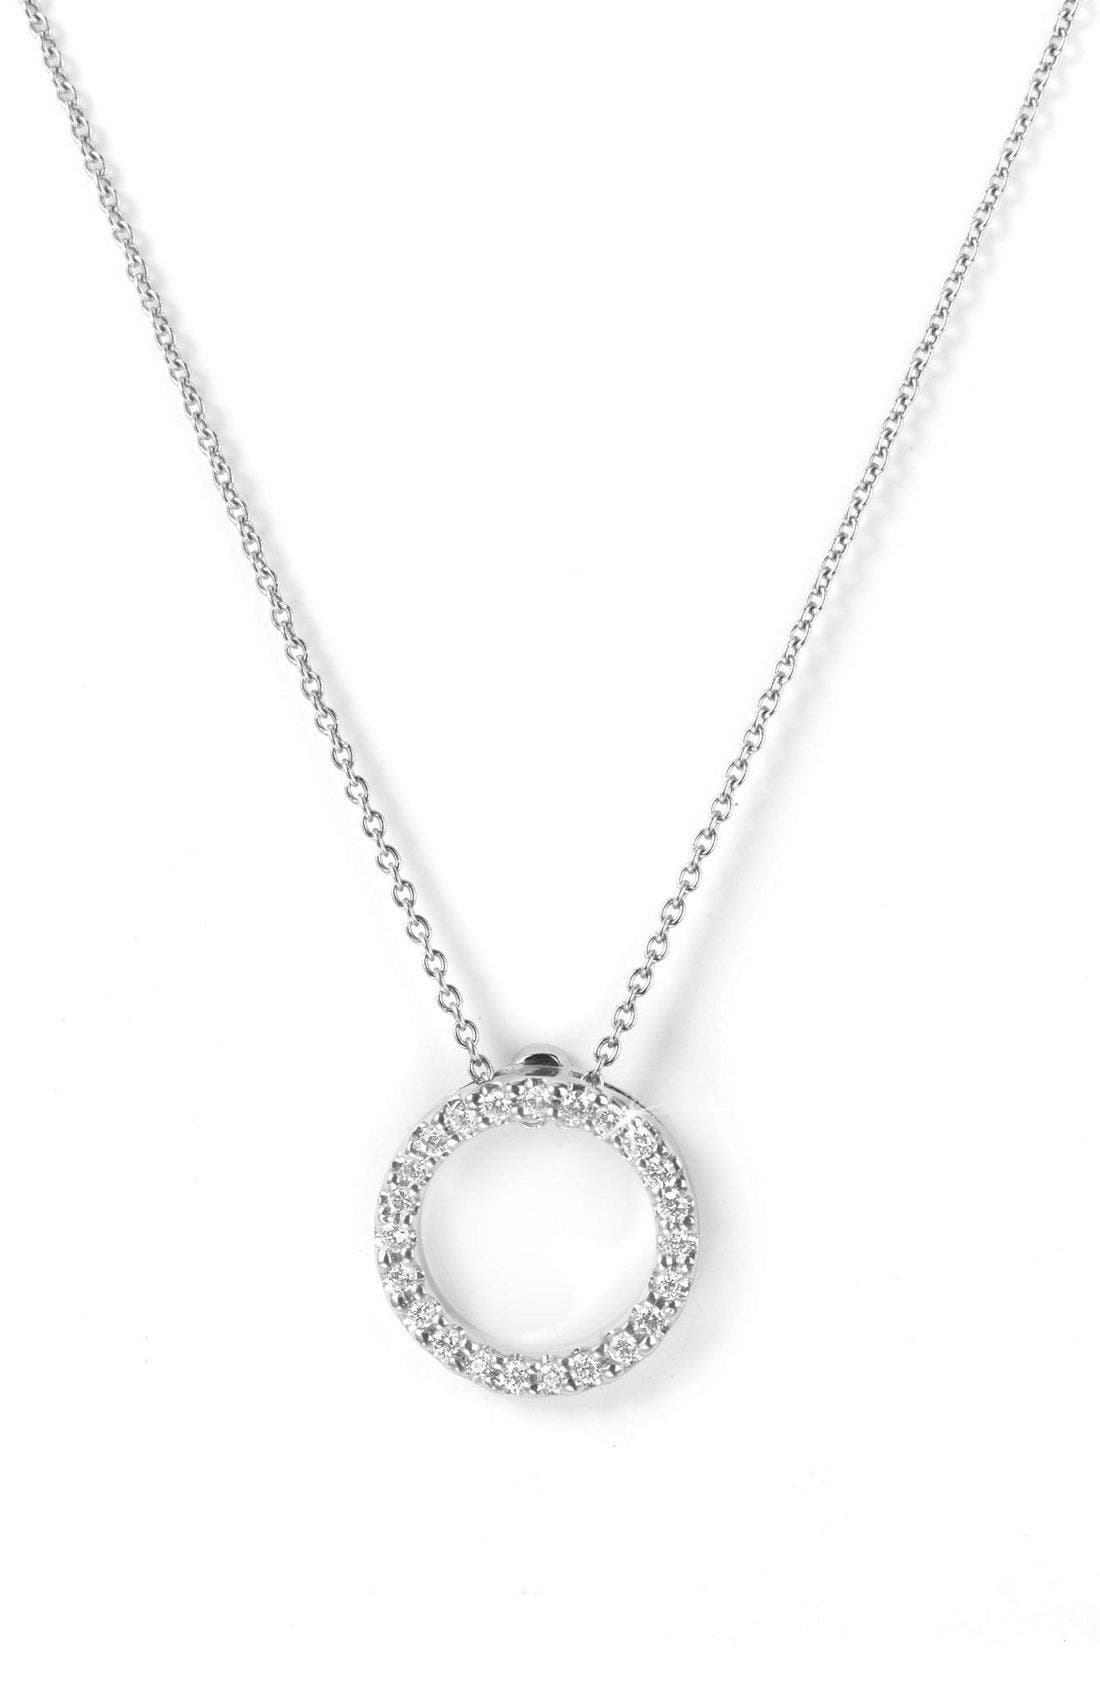 Main Image - Roberto Coin 'Tiny Treasures' Small Diamond Circle Pendant Necklace